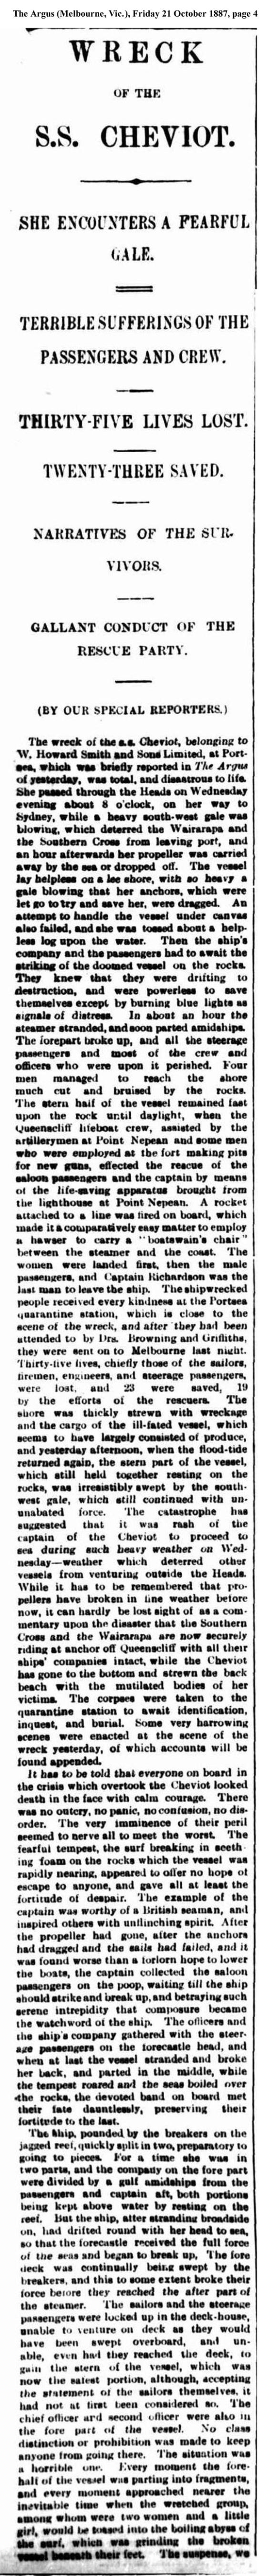 news - Cheviot 1848 col 1